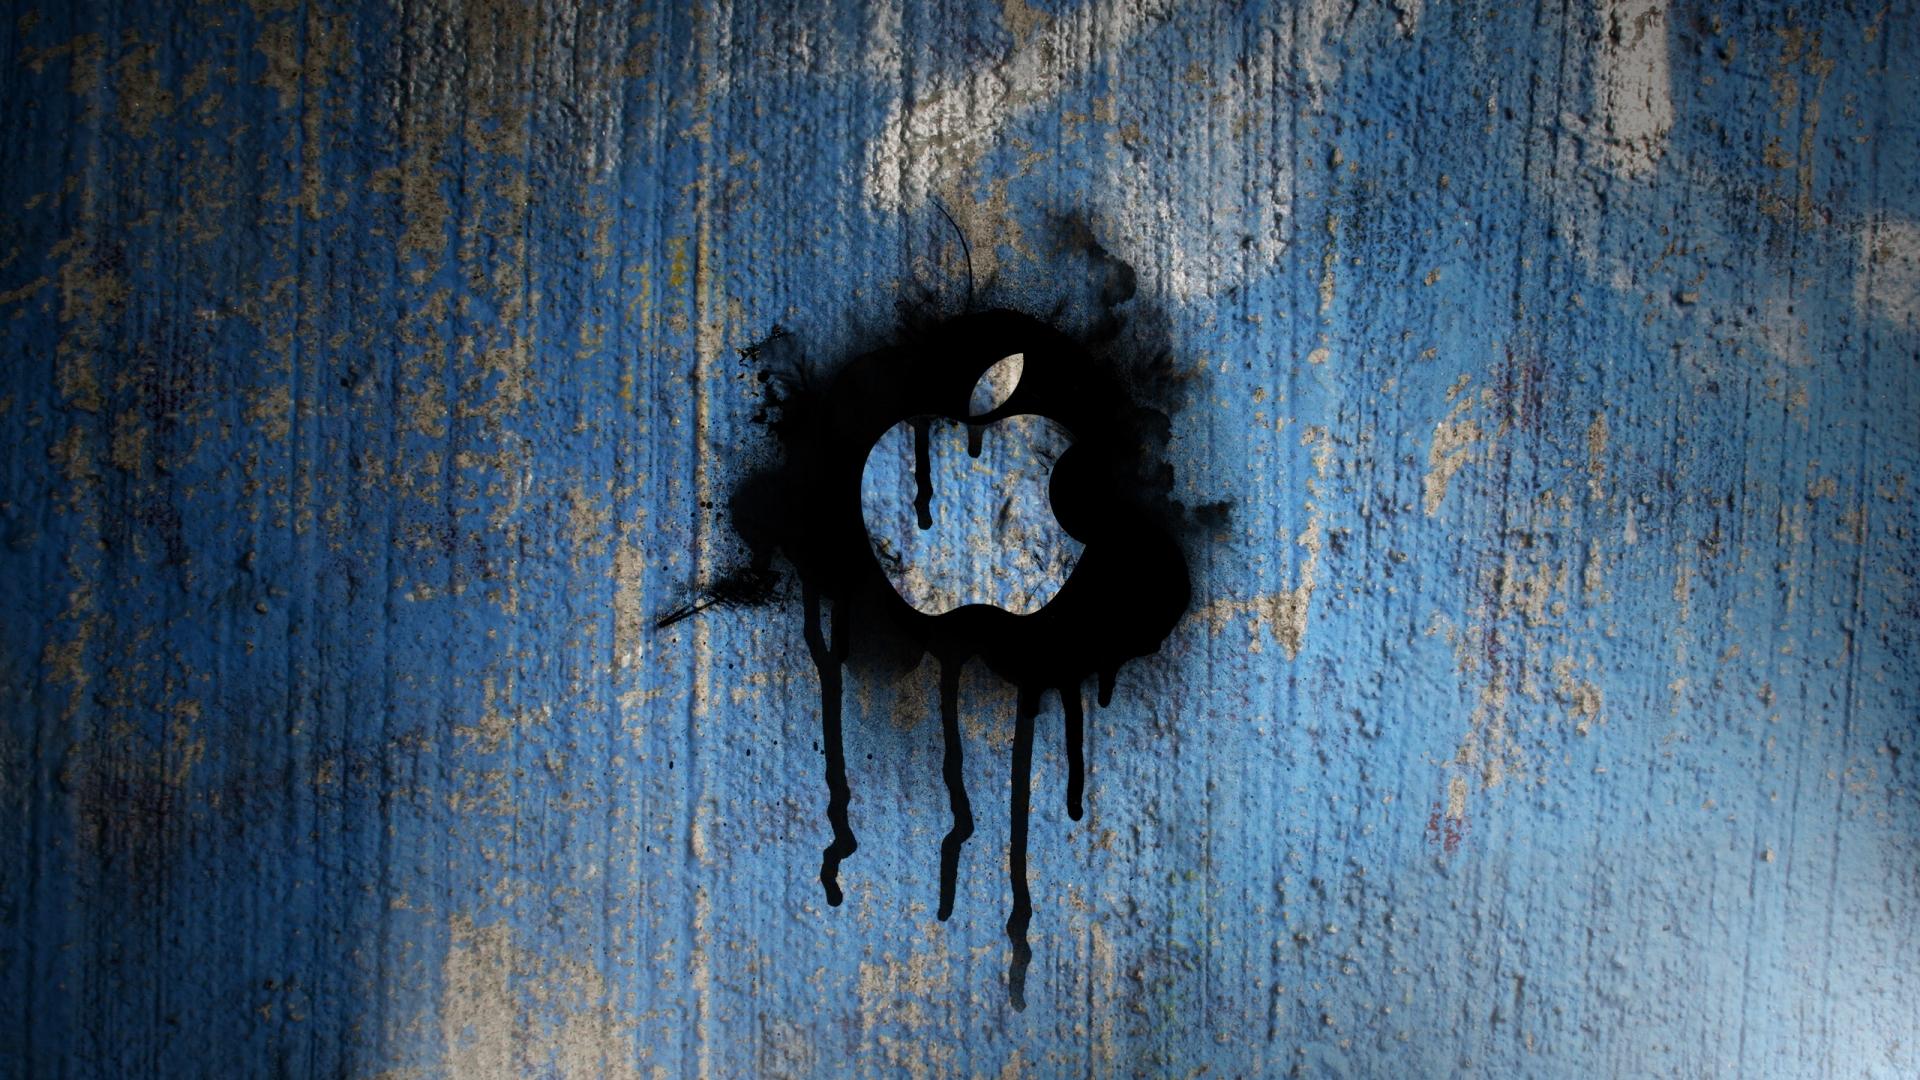 Apple-Spray-Painted-Wallpaper